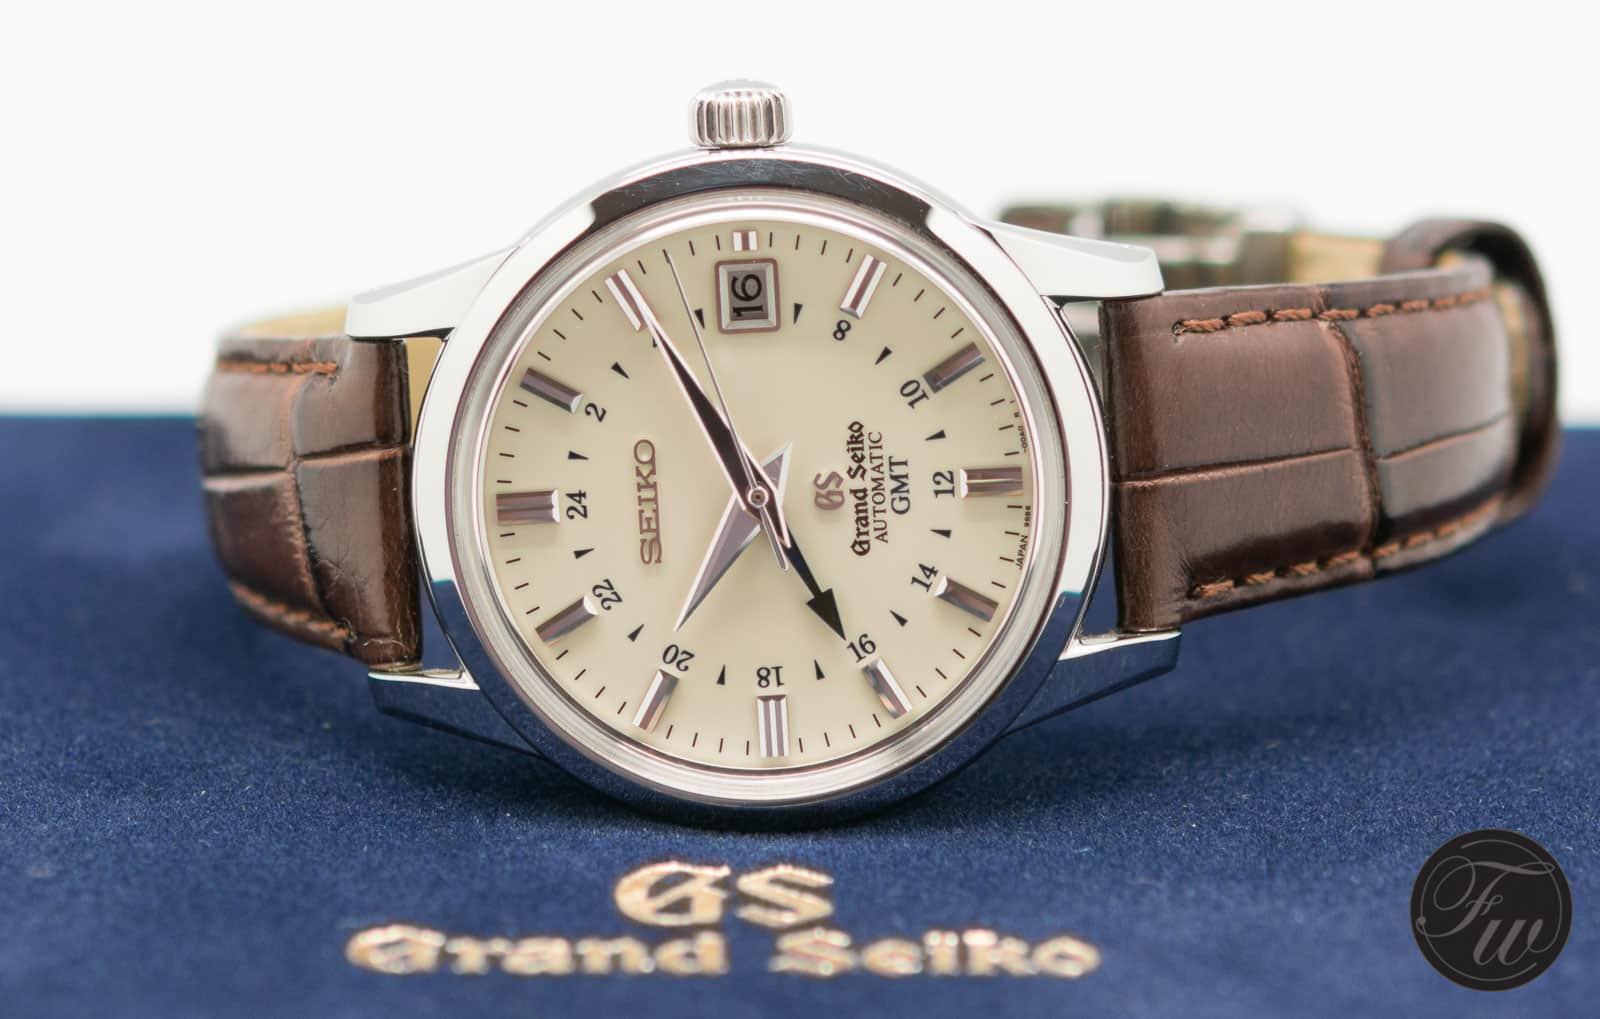 GrandSeikoSBGM021HDR-8211